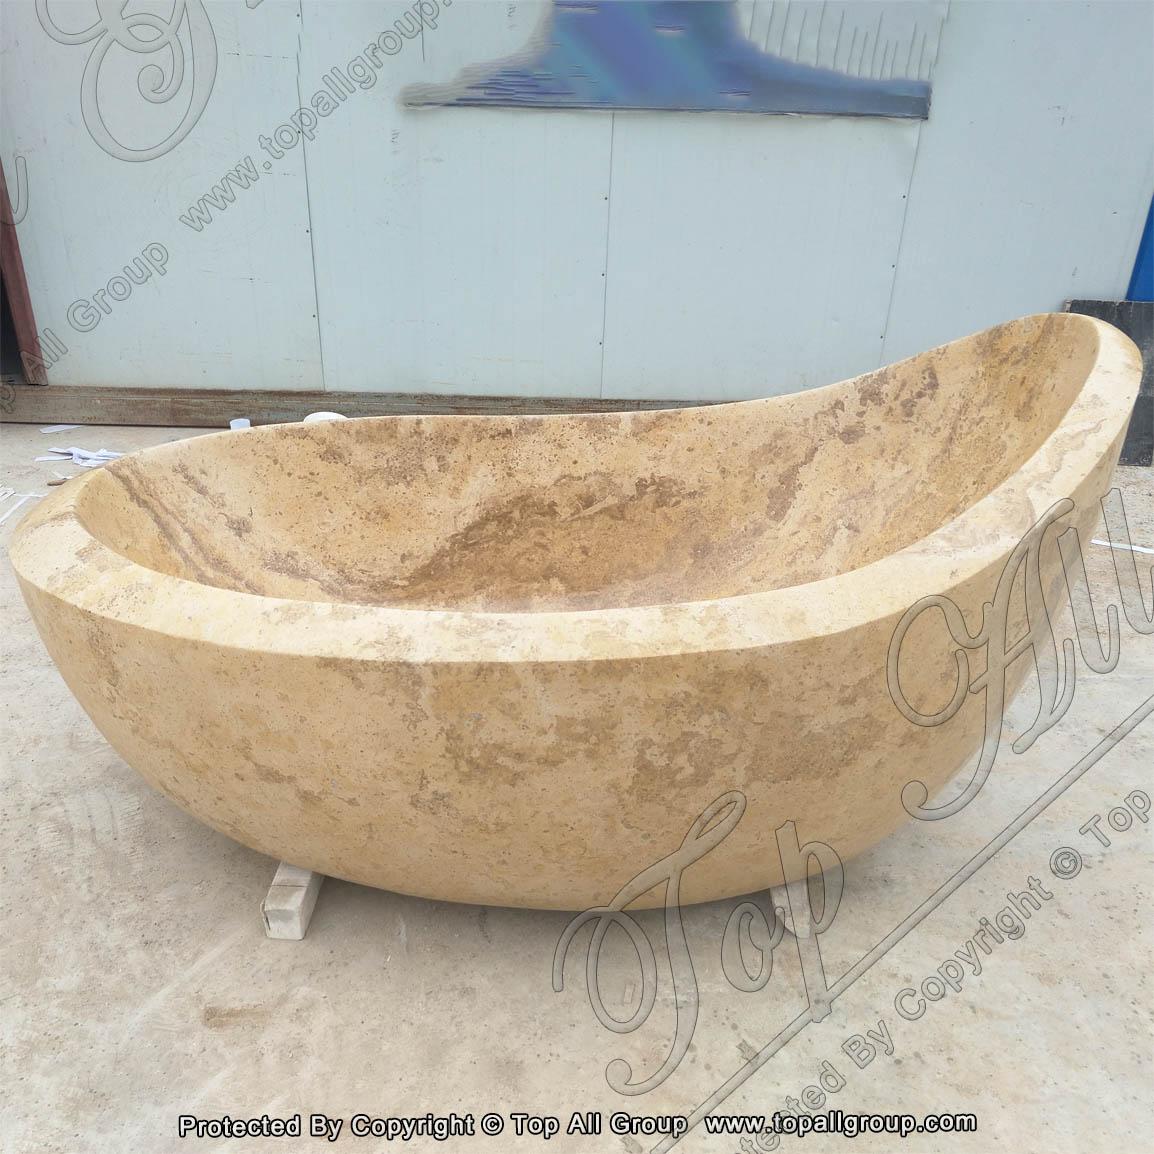 Artificial Marble Bathtub